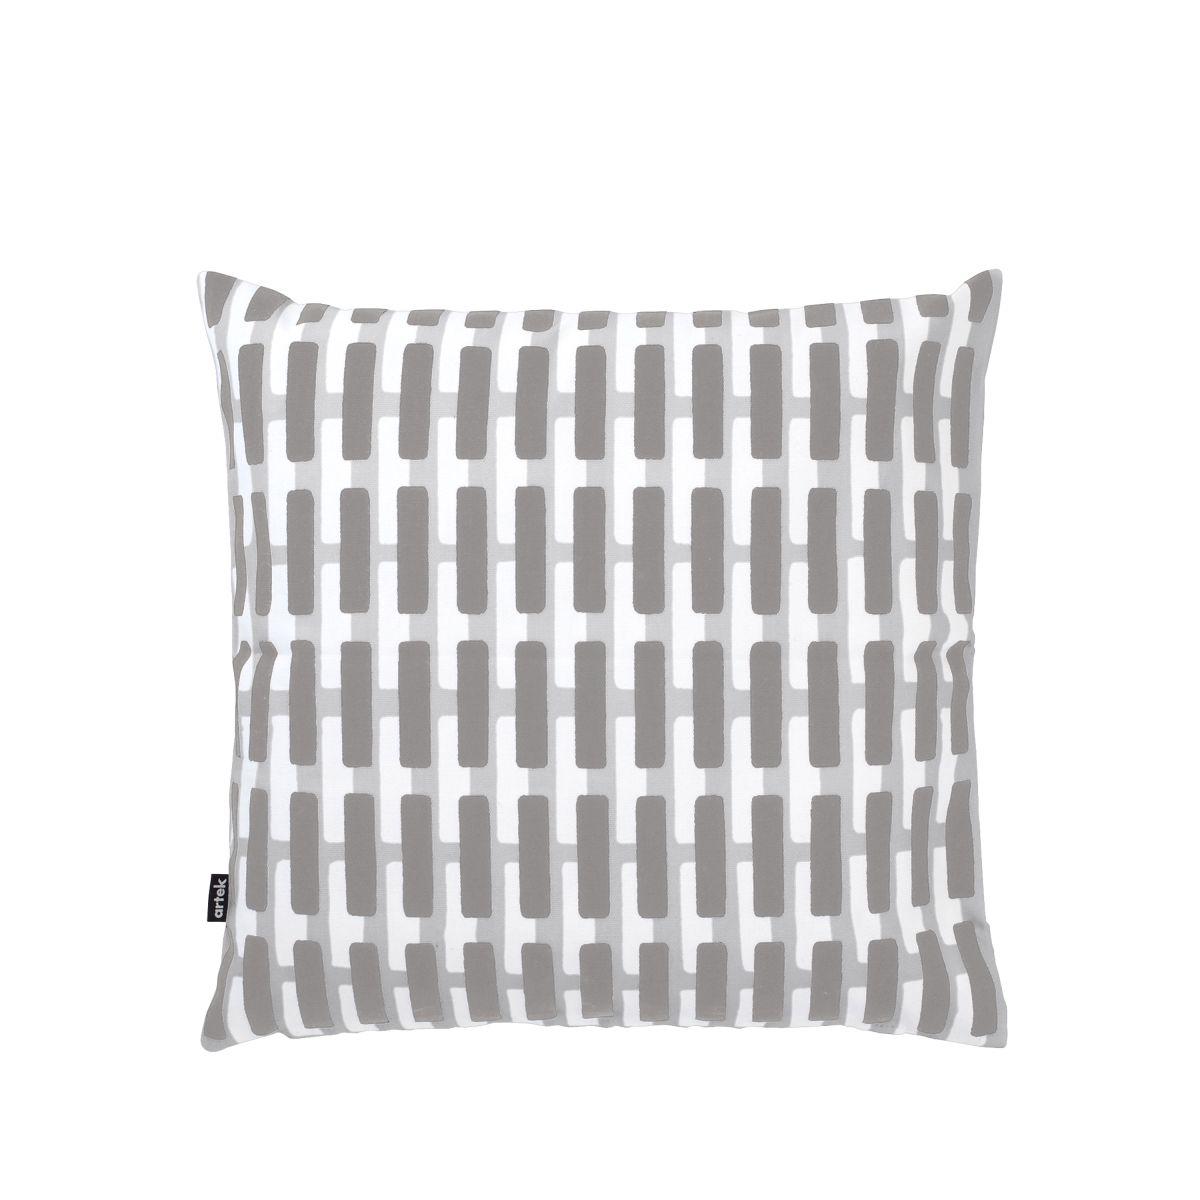 Siena-Cushion-Cover-Cotton-Canvas-small-40-x-40-cm-grey-light-grey-shadow-3976675